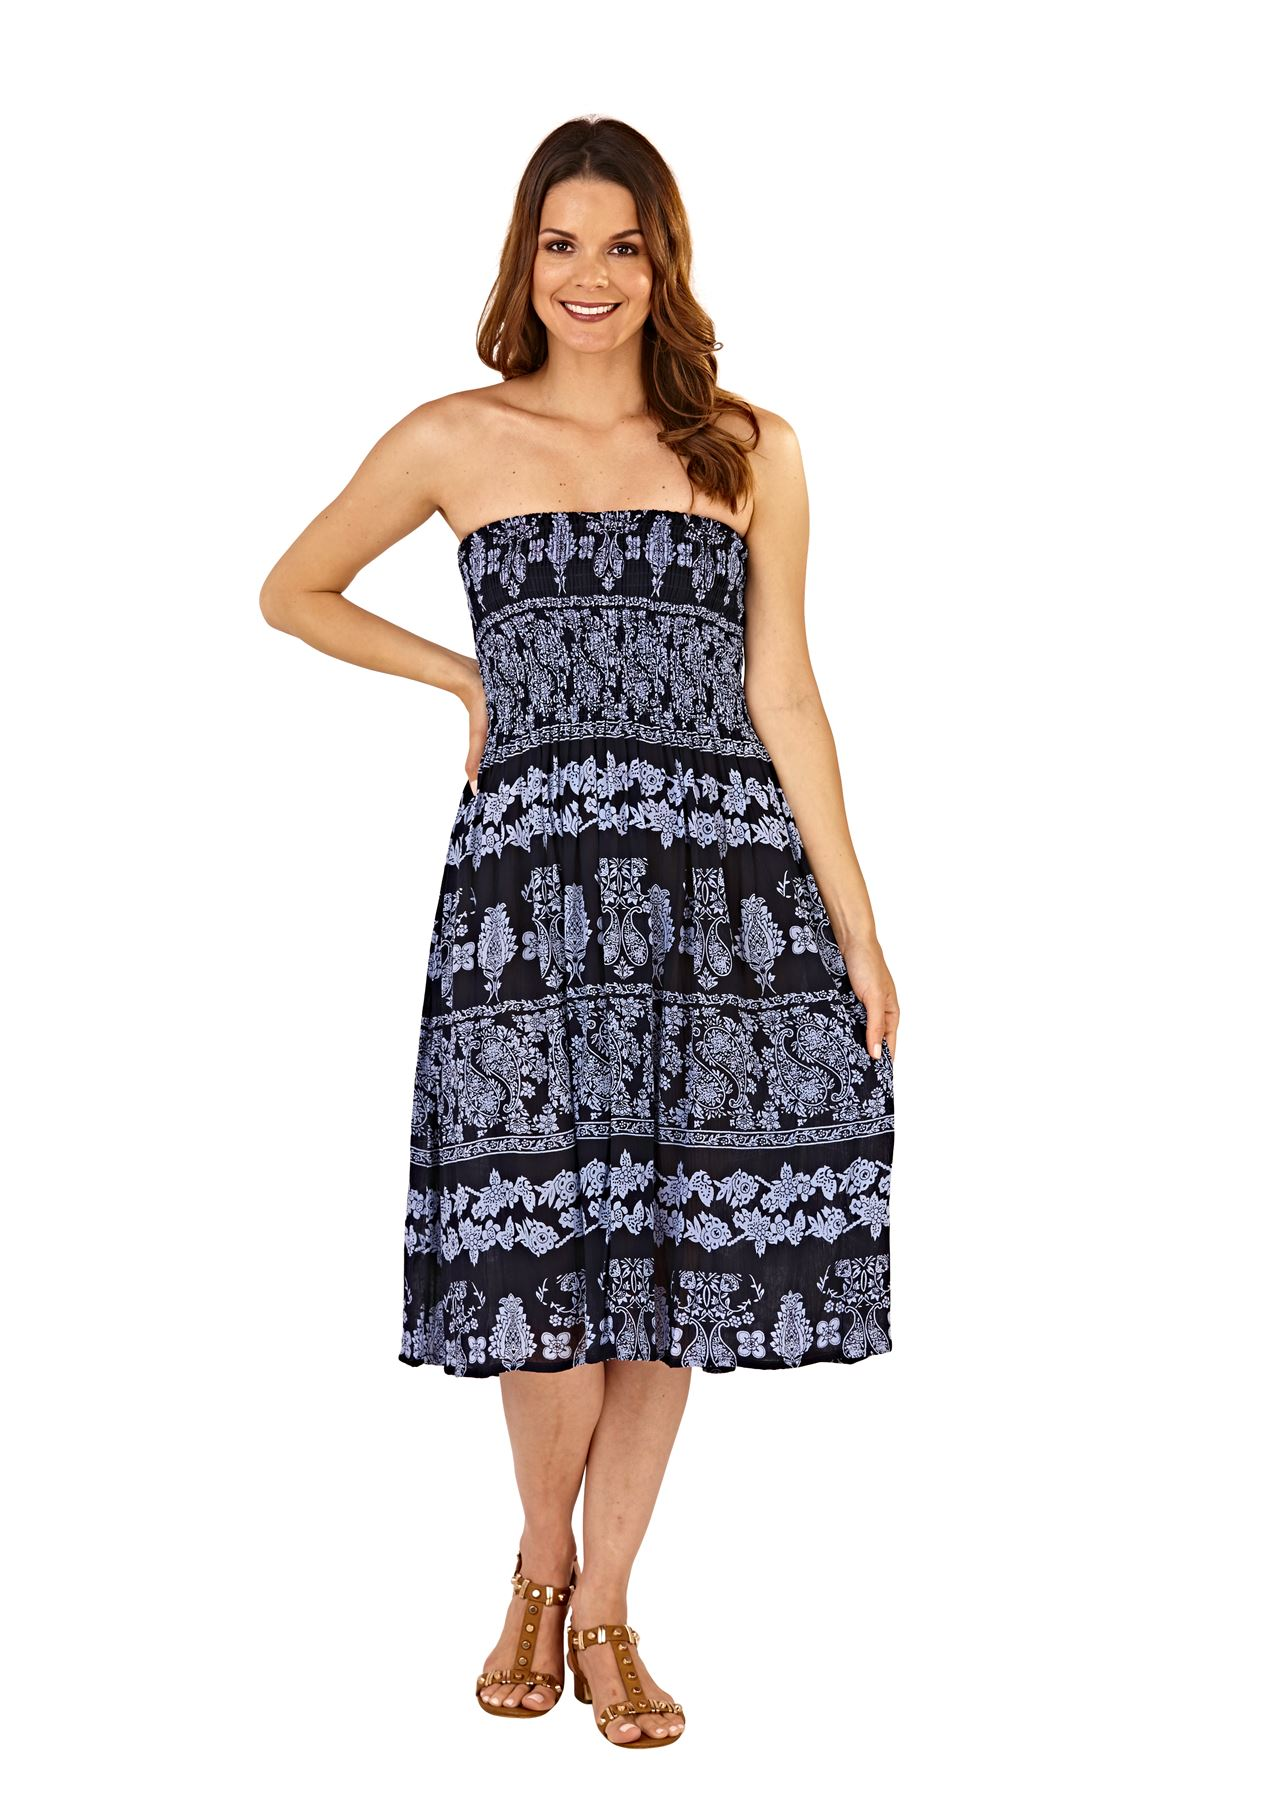 Ladies-Pistachio-Viscose-3-Way-Halter-Bandeau-Skirt-Summer-Beach-Dresses thumbnail 7